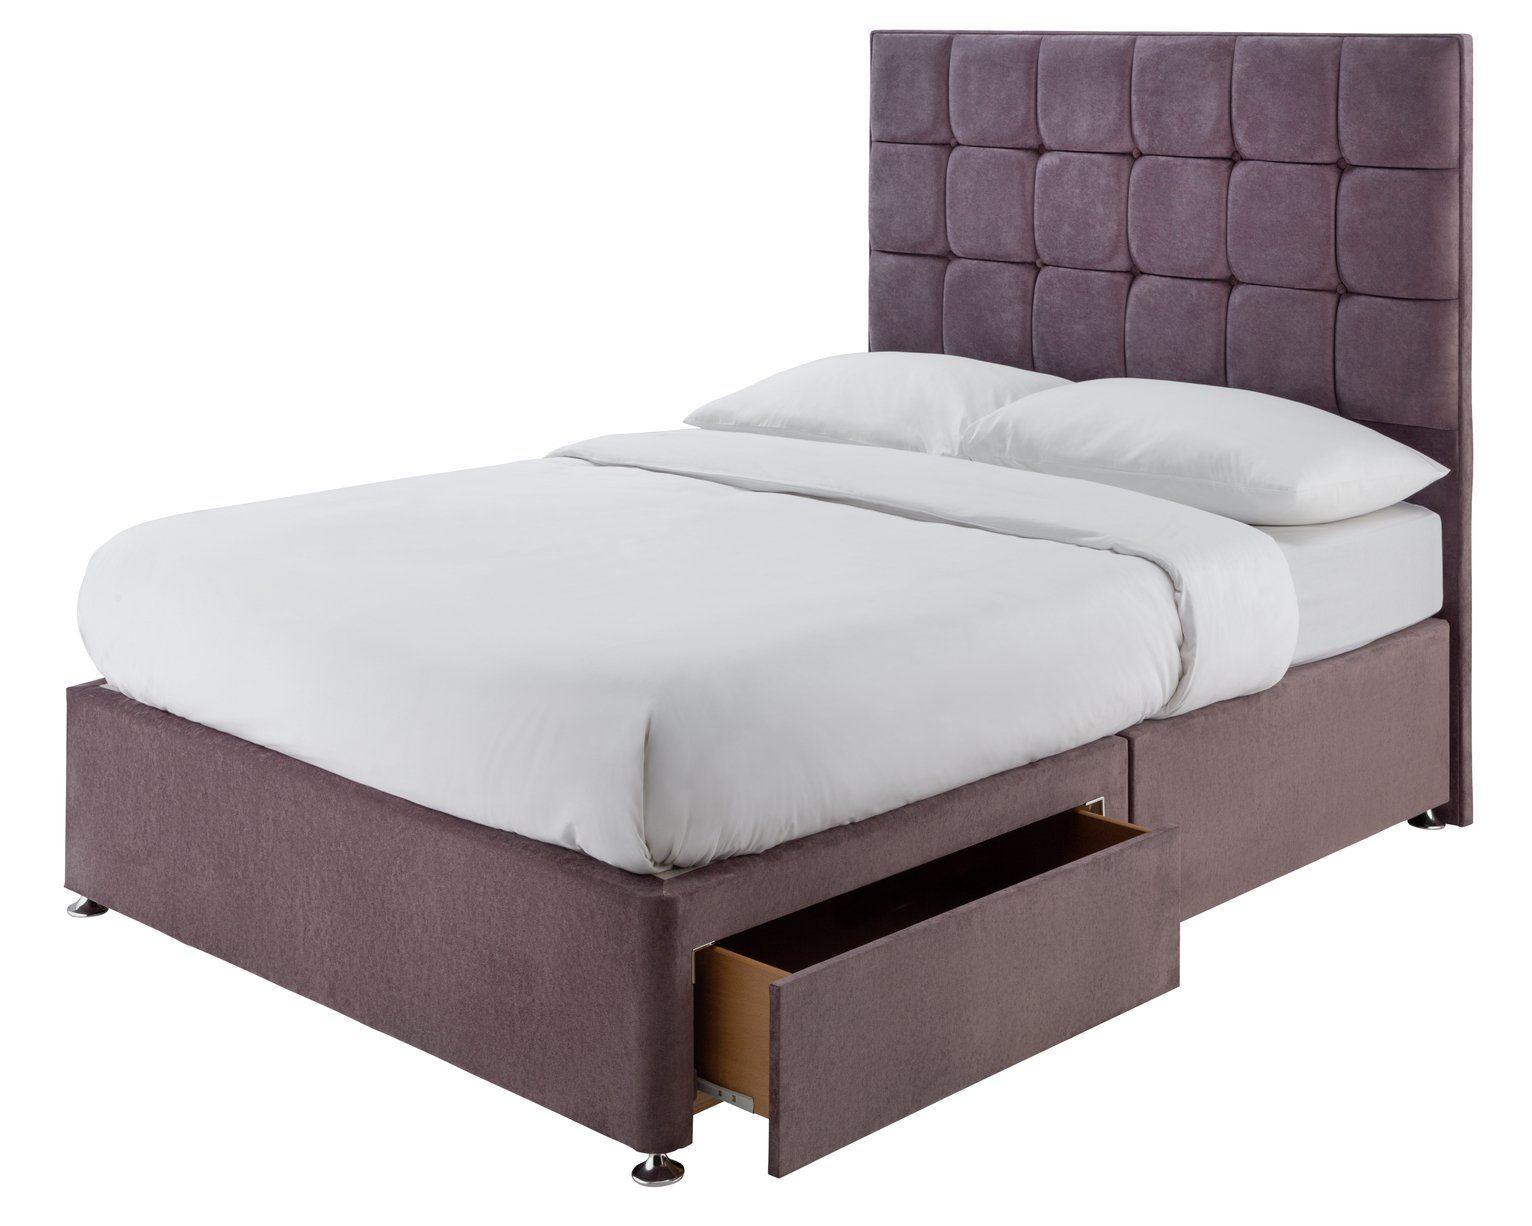 Buy Forty Winks 1500 Pocket Gel 2 Drawer Double Divan Mauve Divan Beds Argos In 2020 Divan Bed Double Divan Bed Mattress Springs